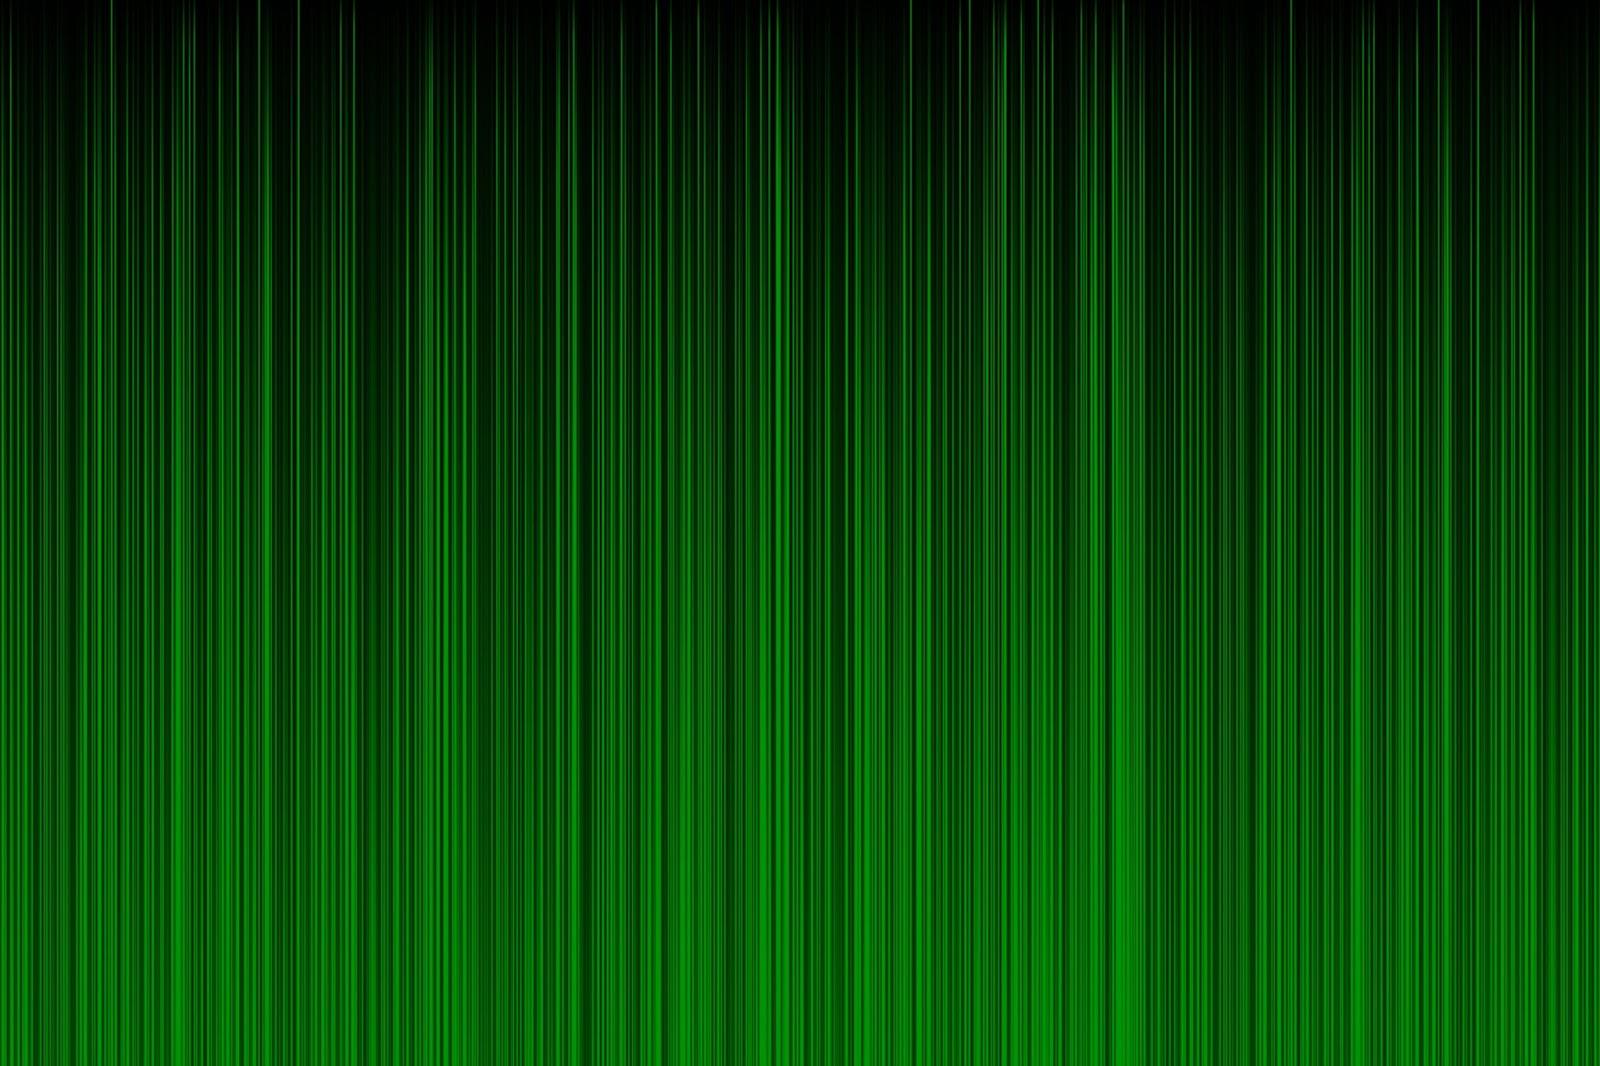 Unduh 58 Koleksi Background Hijau Terang Terbaik